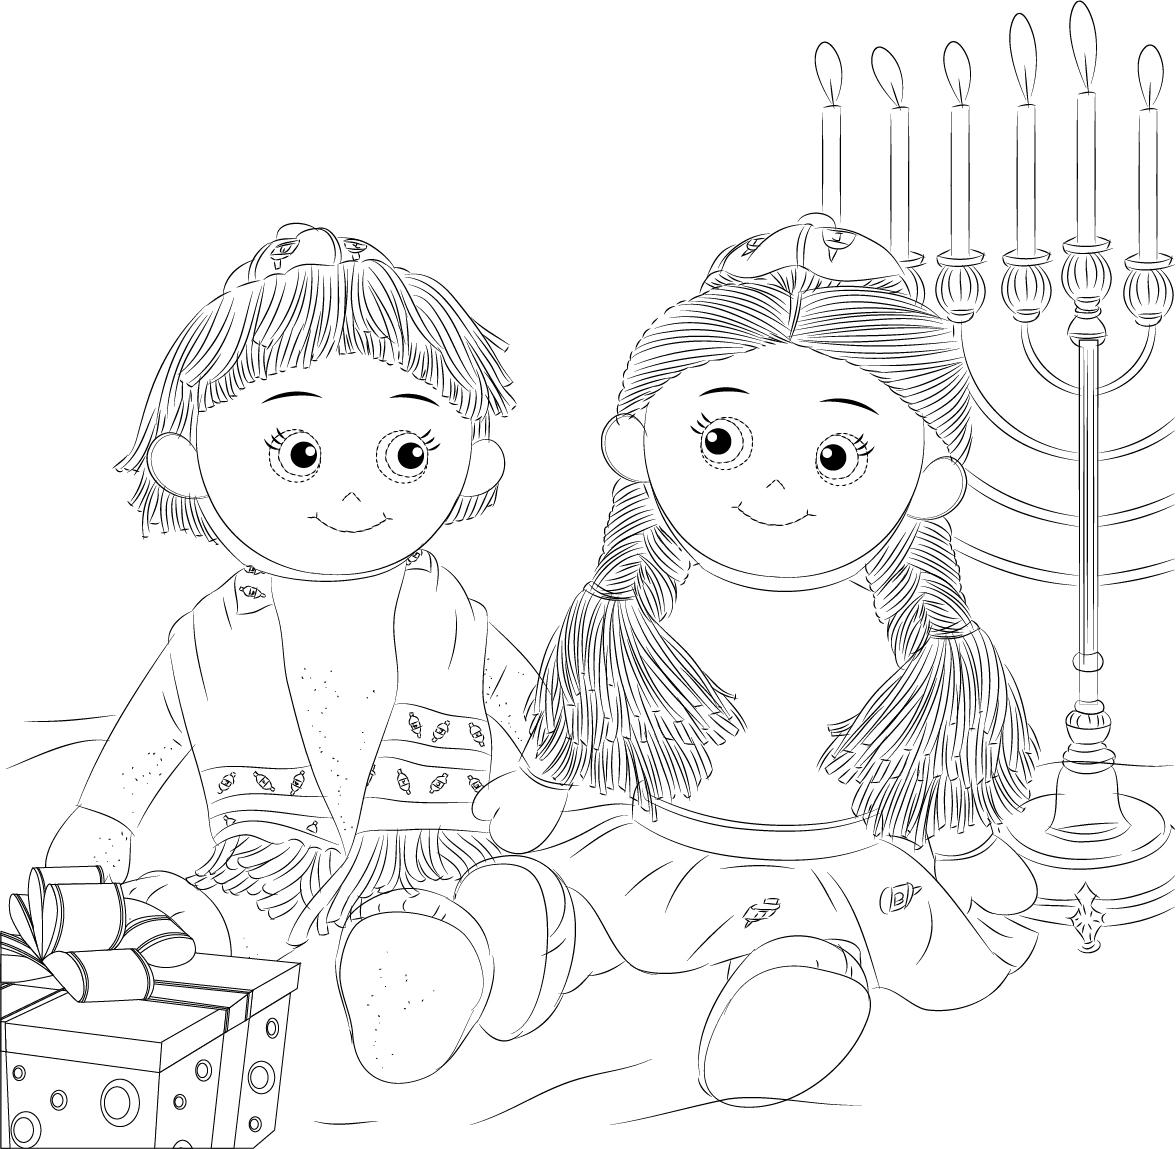 Kippah Kantor Coloring Sheet Jewish Elf On A Shelf